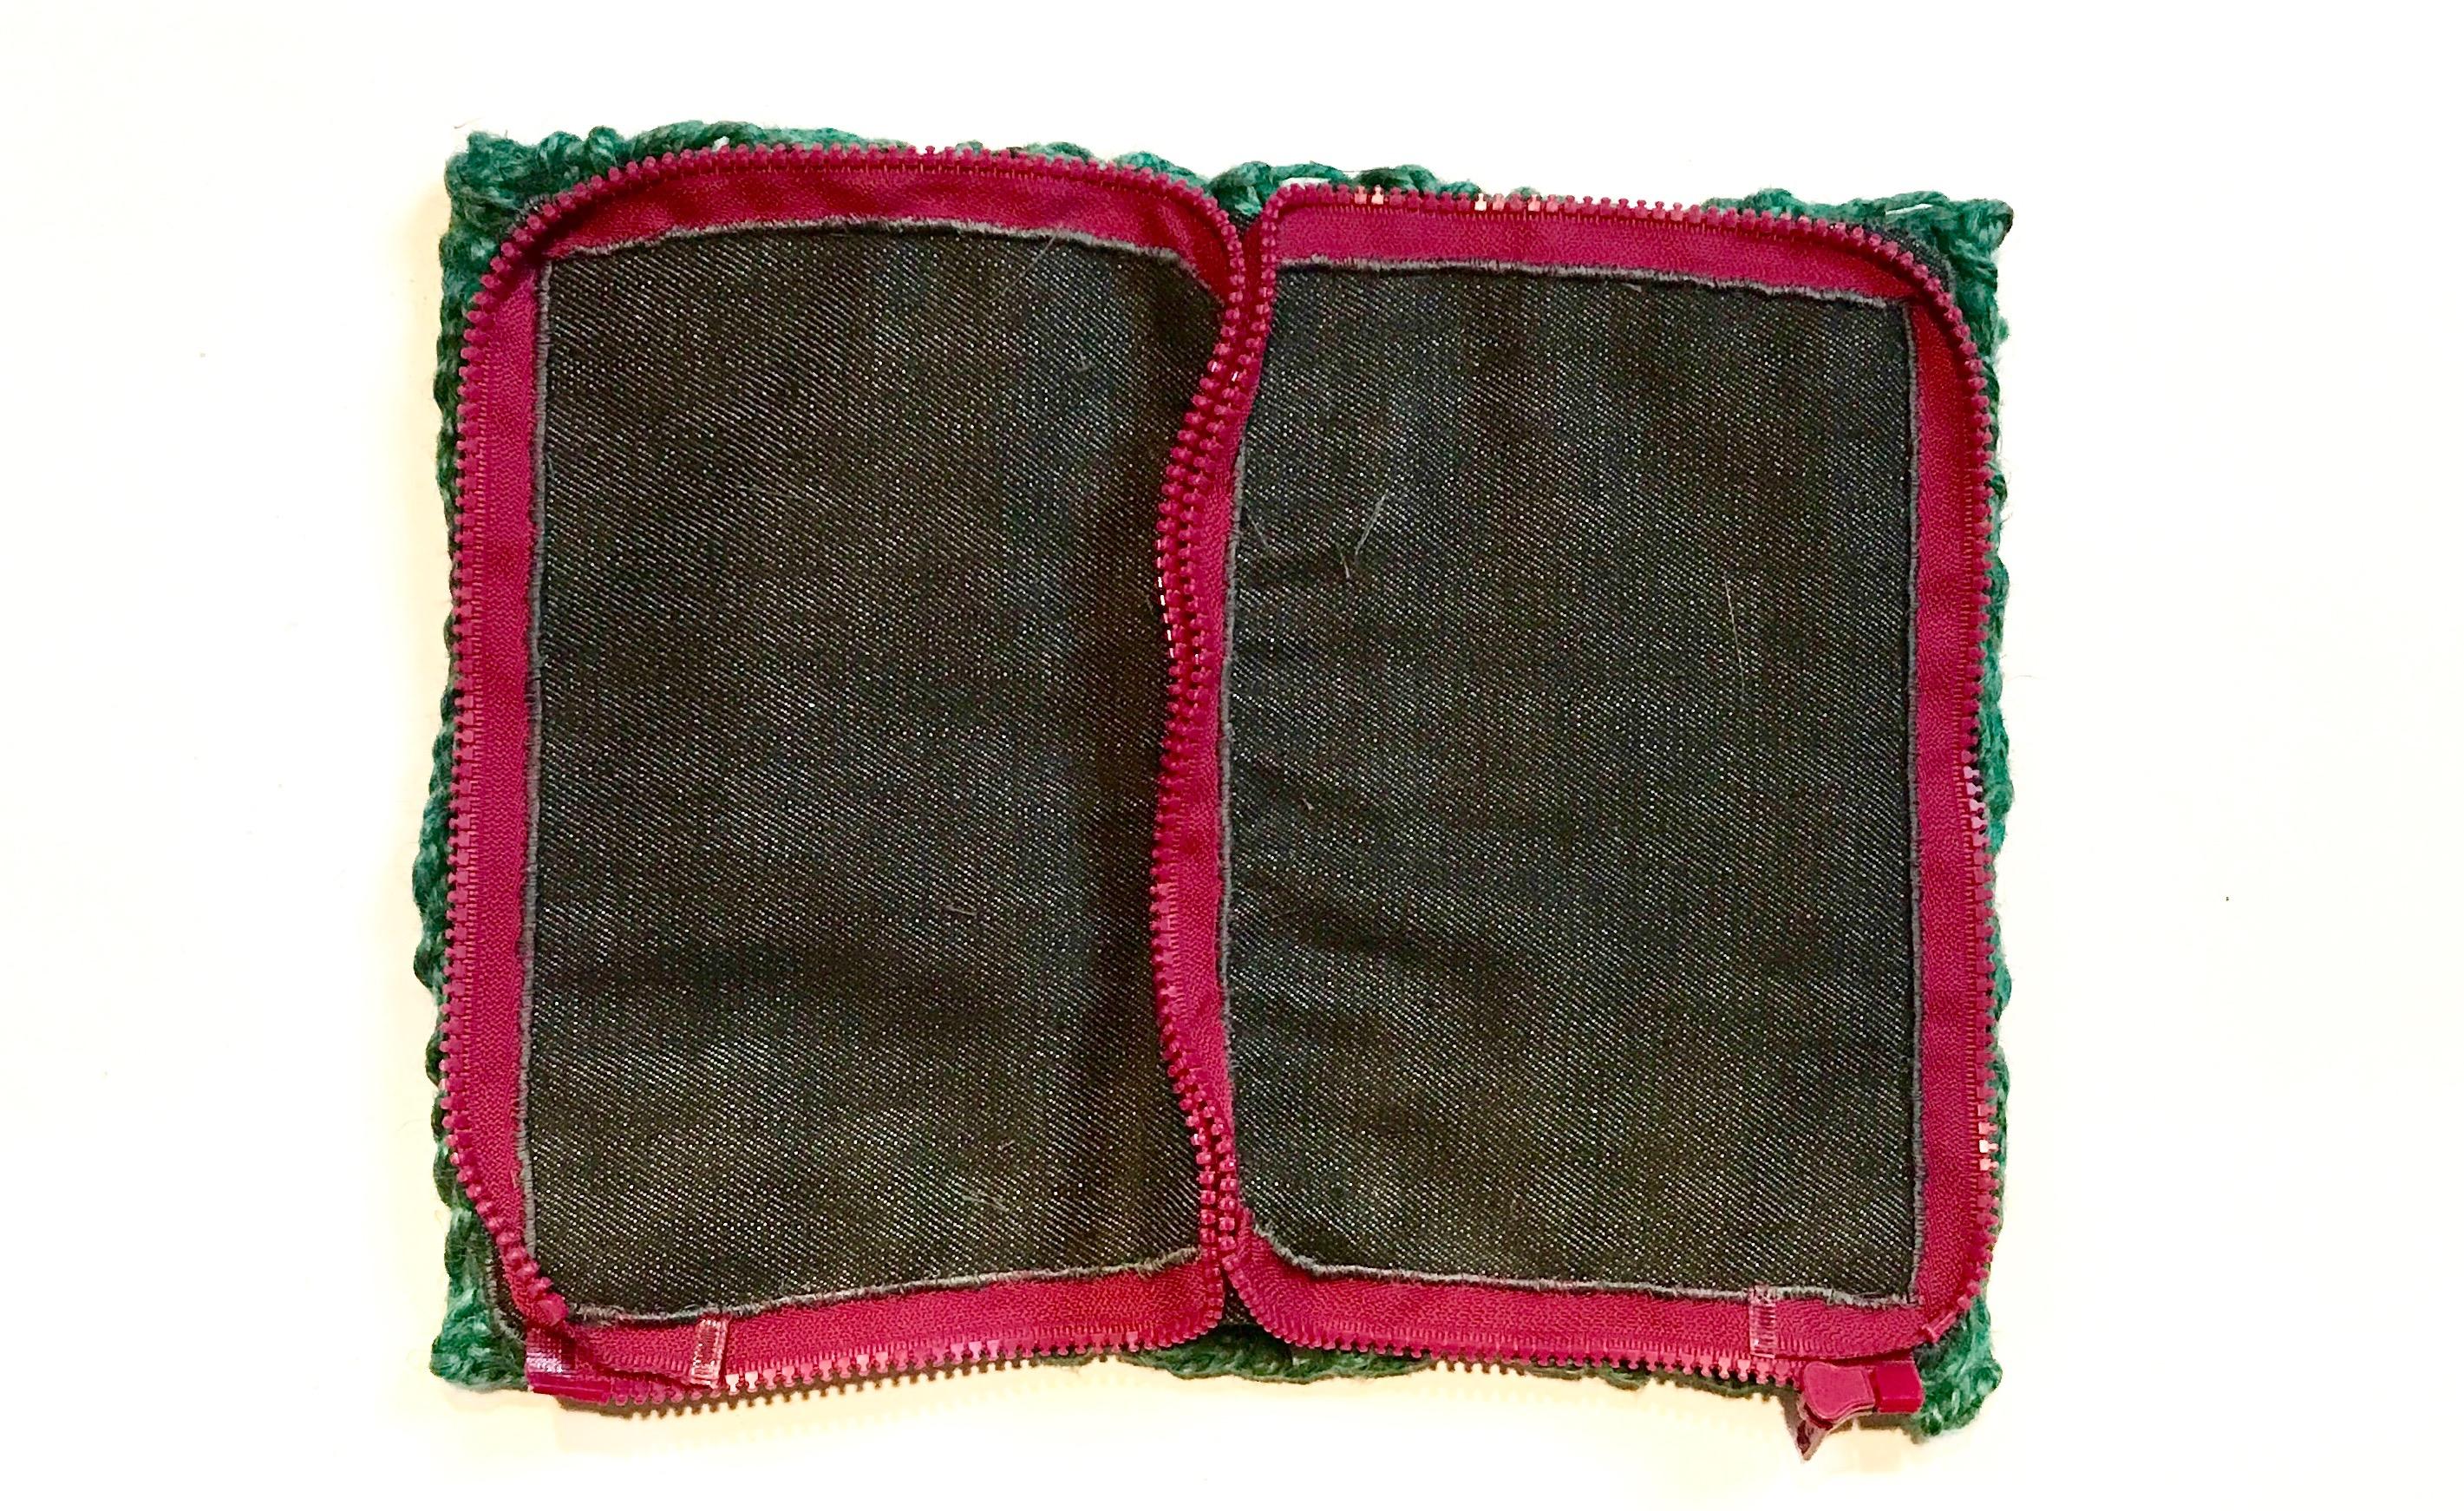 5 Twine handbag crochet denim lining fiskars and zipper sewn inside view myfixituplife